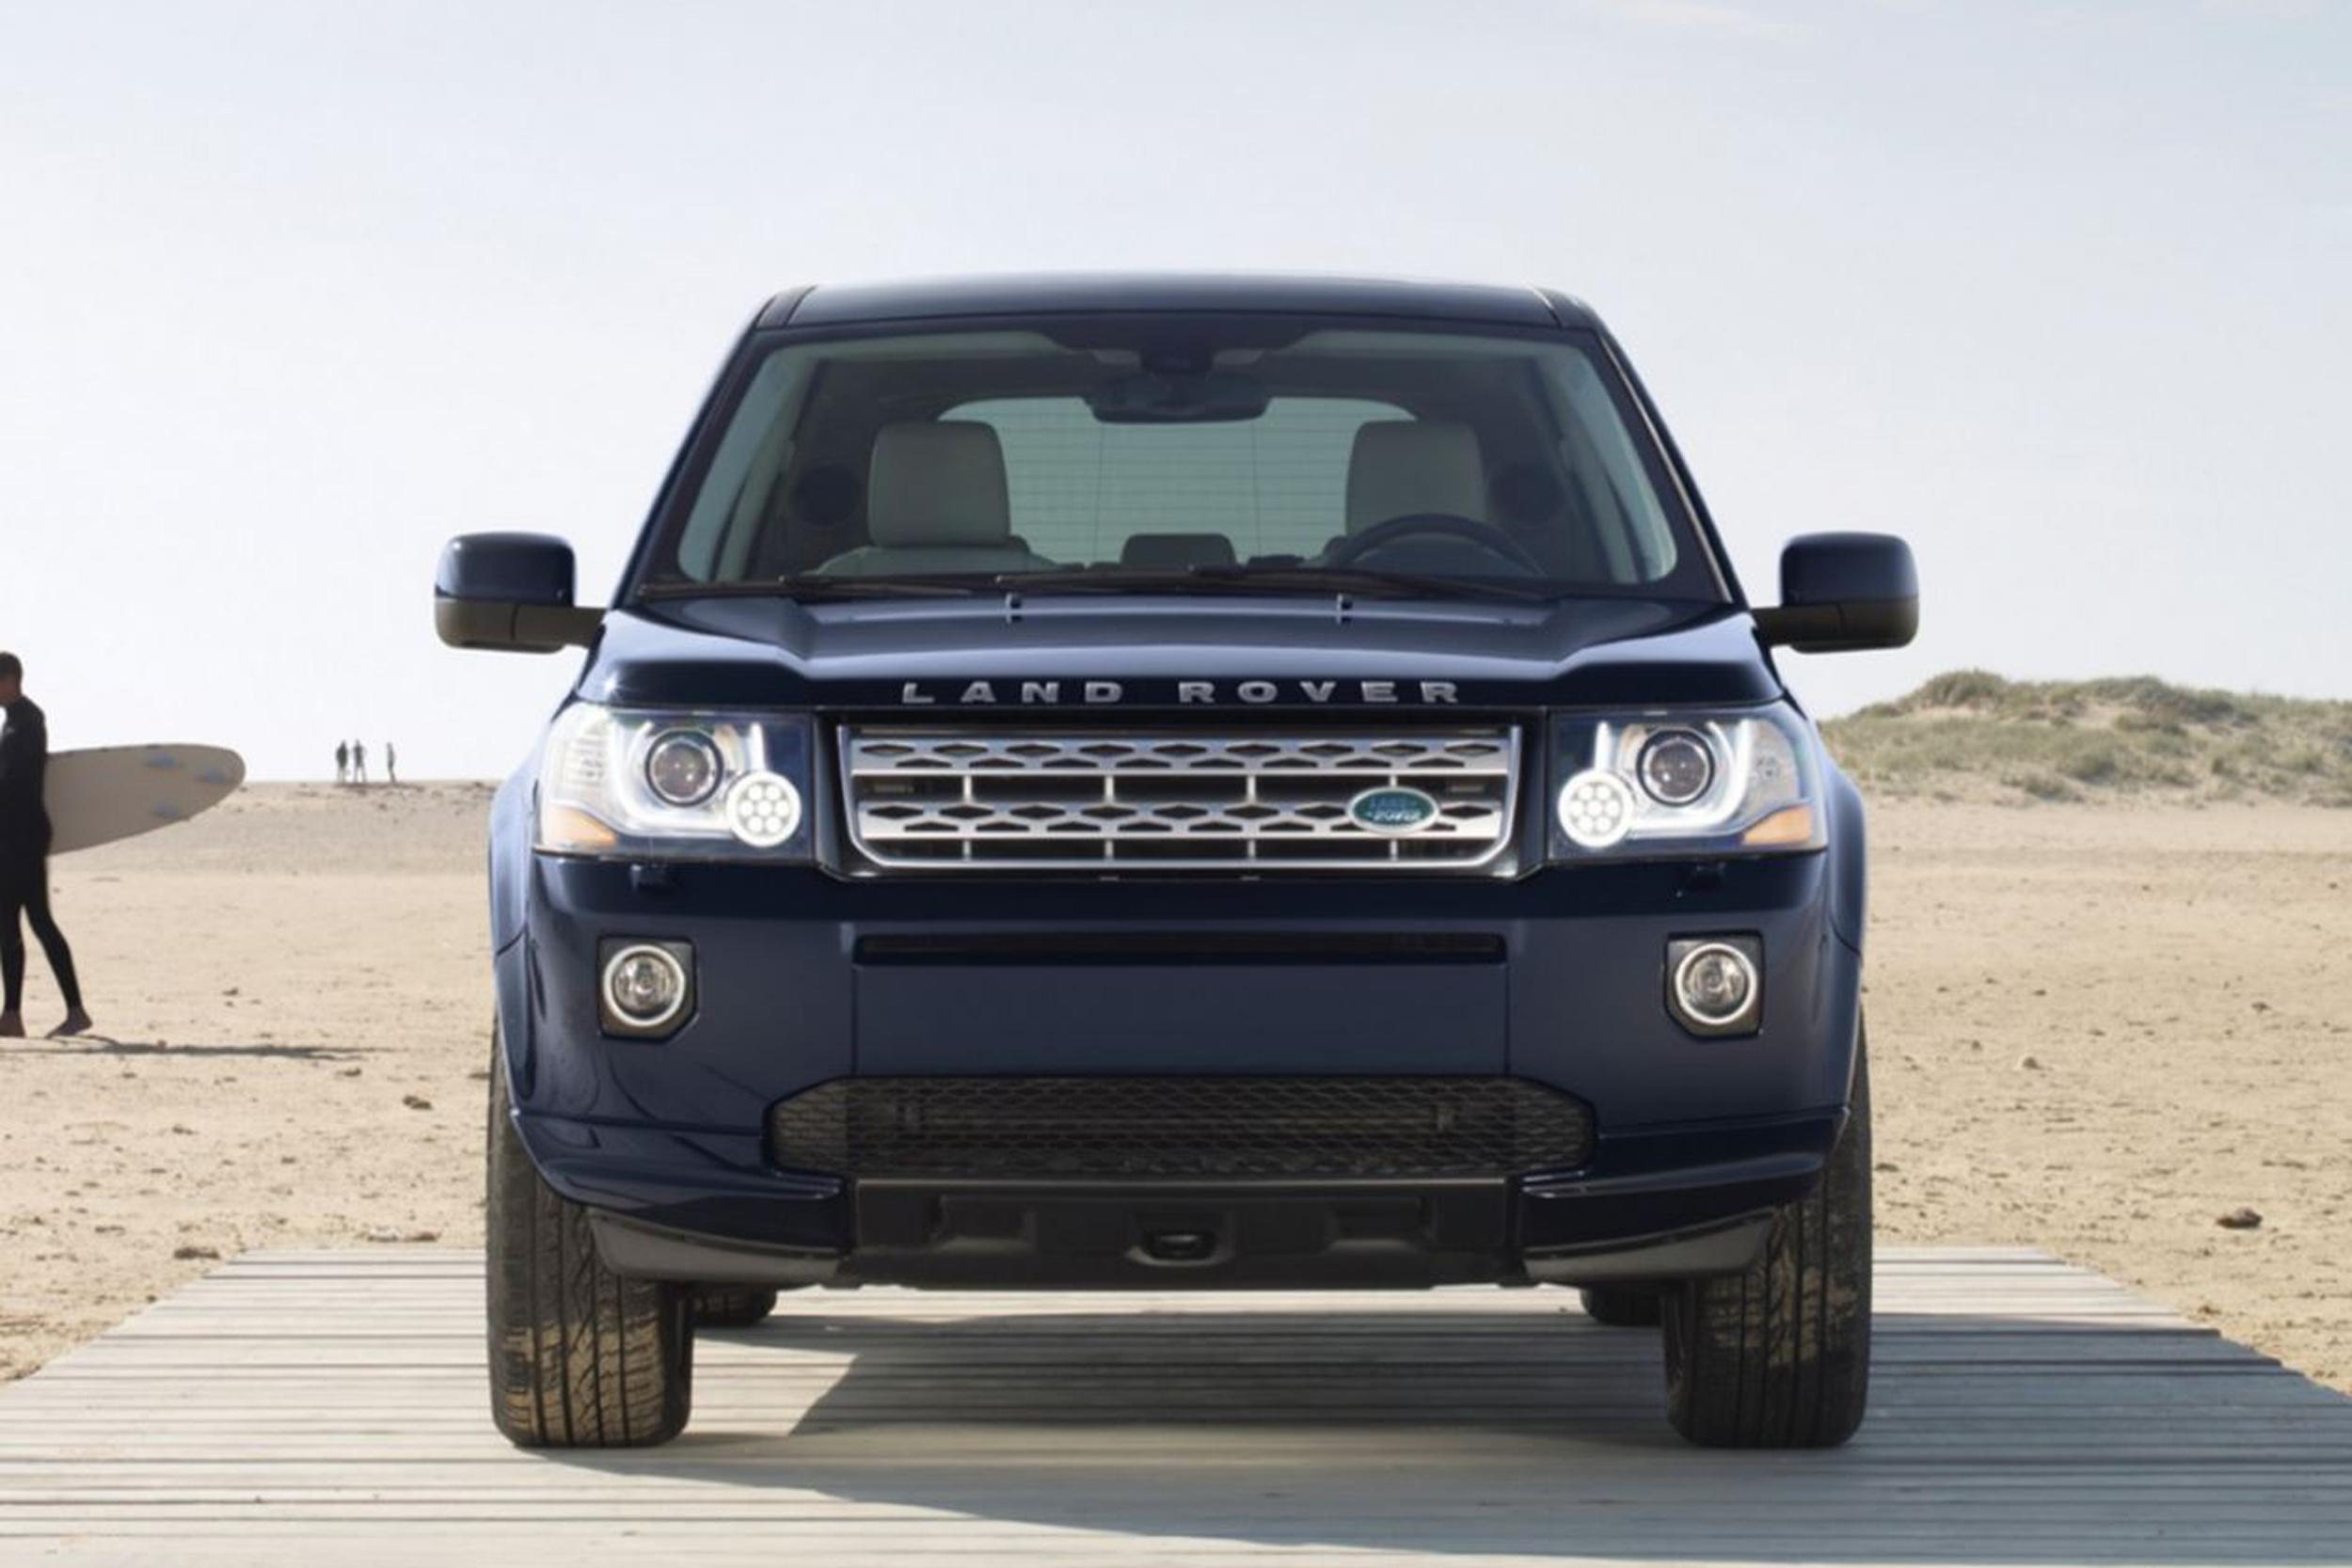 full vehicles rover hse living qatar option price landrover img land